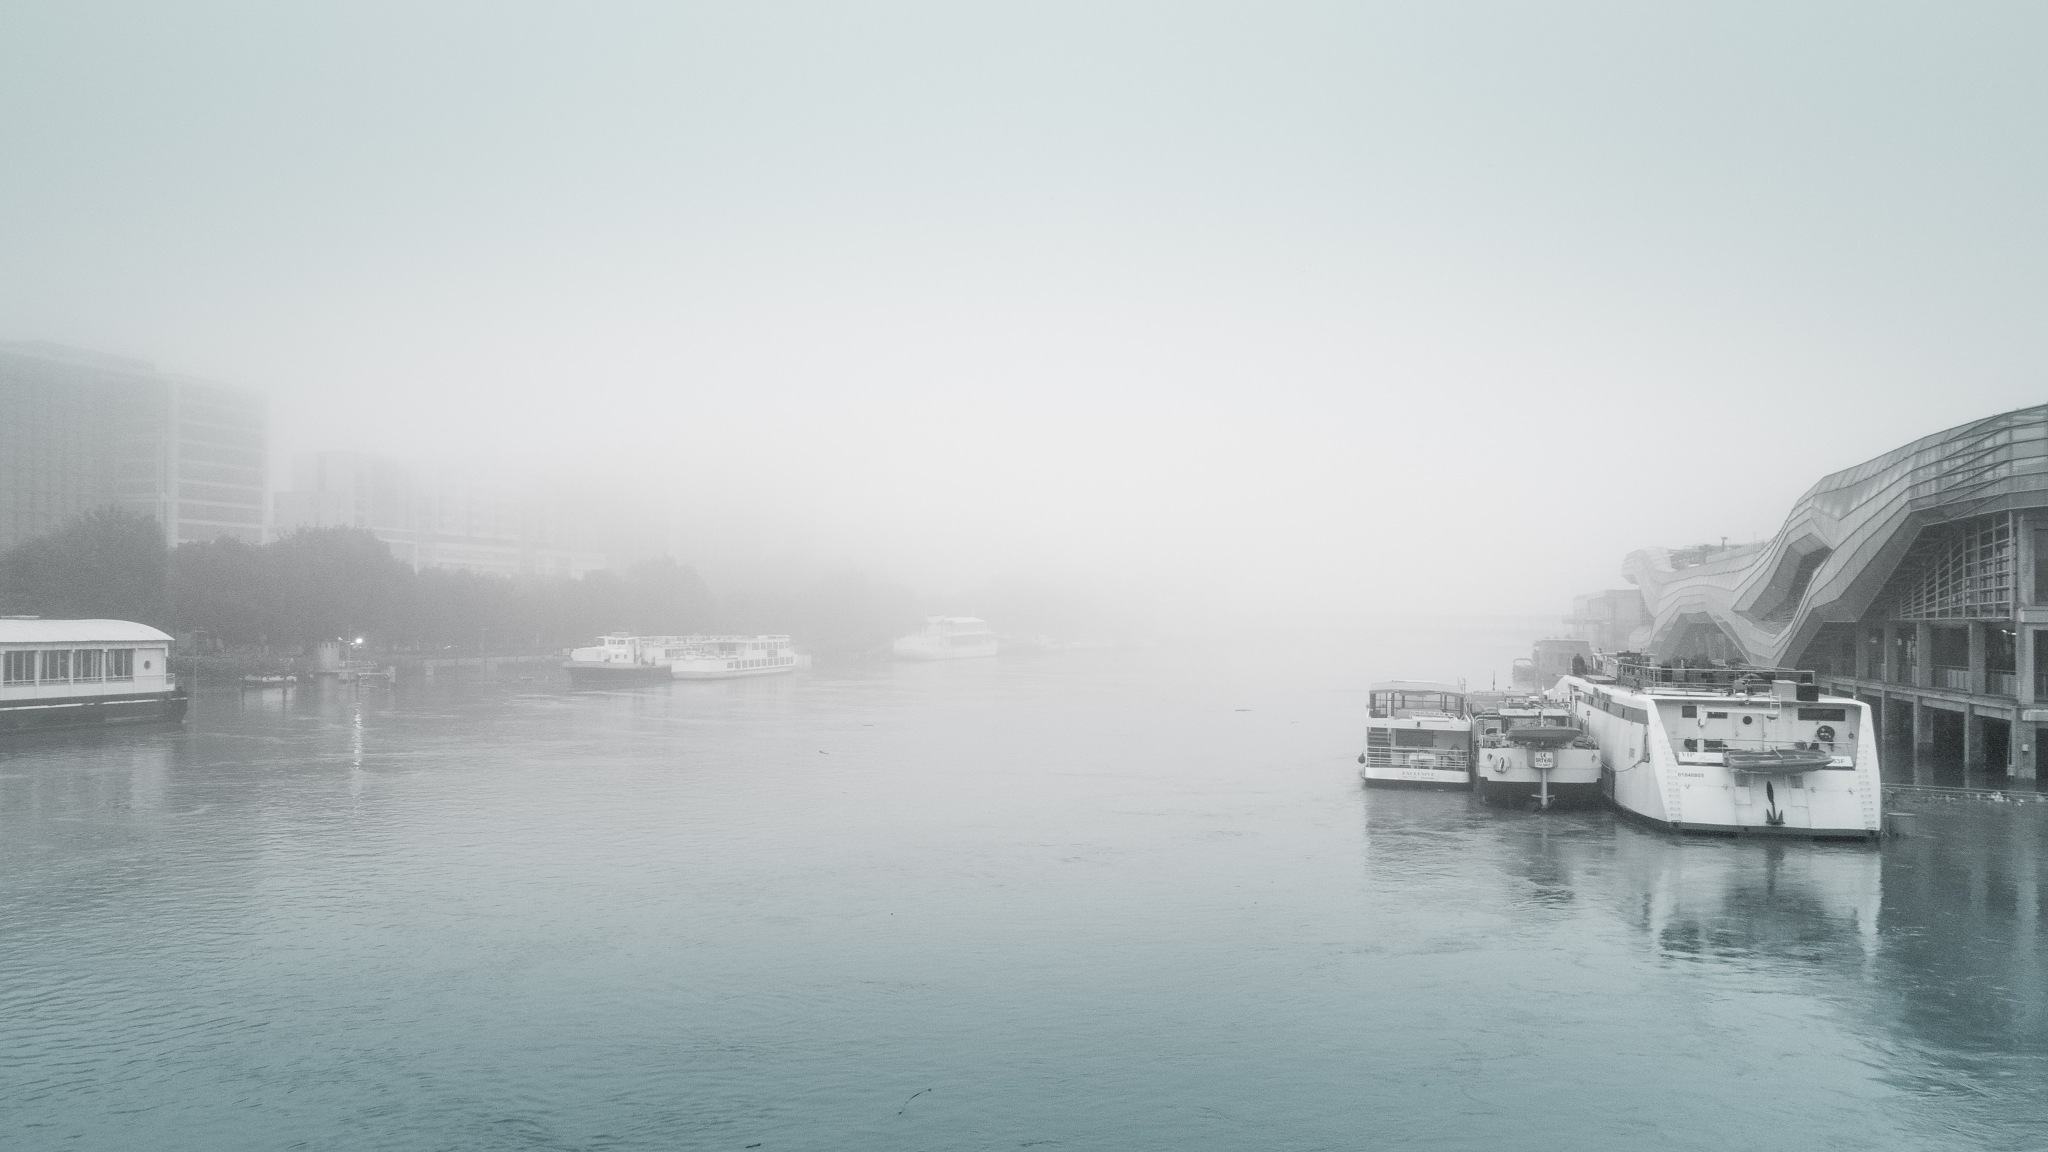 Fog on the Seine river by Hervé Samson